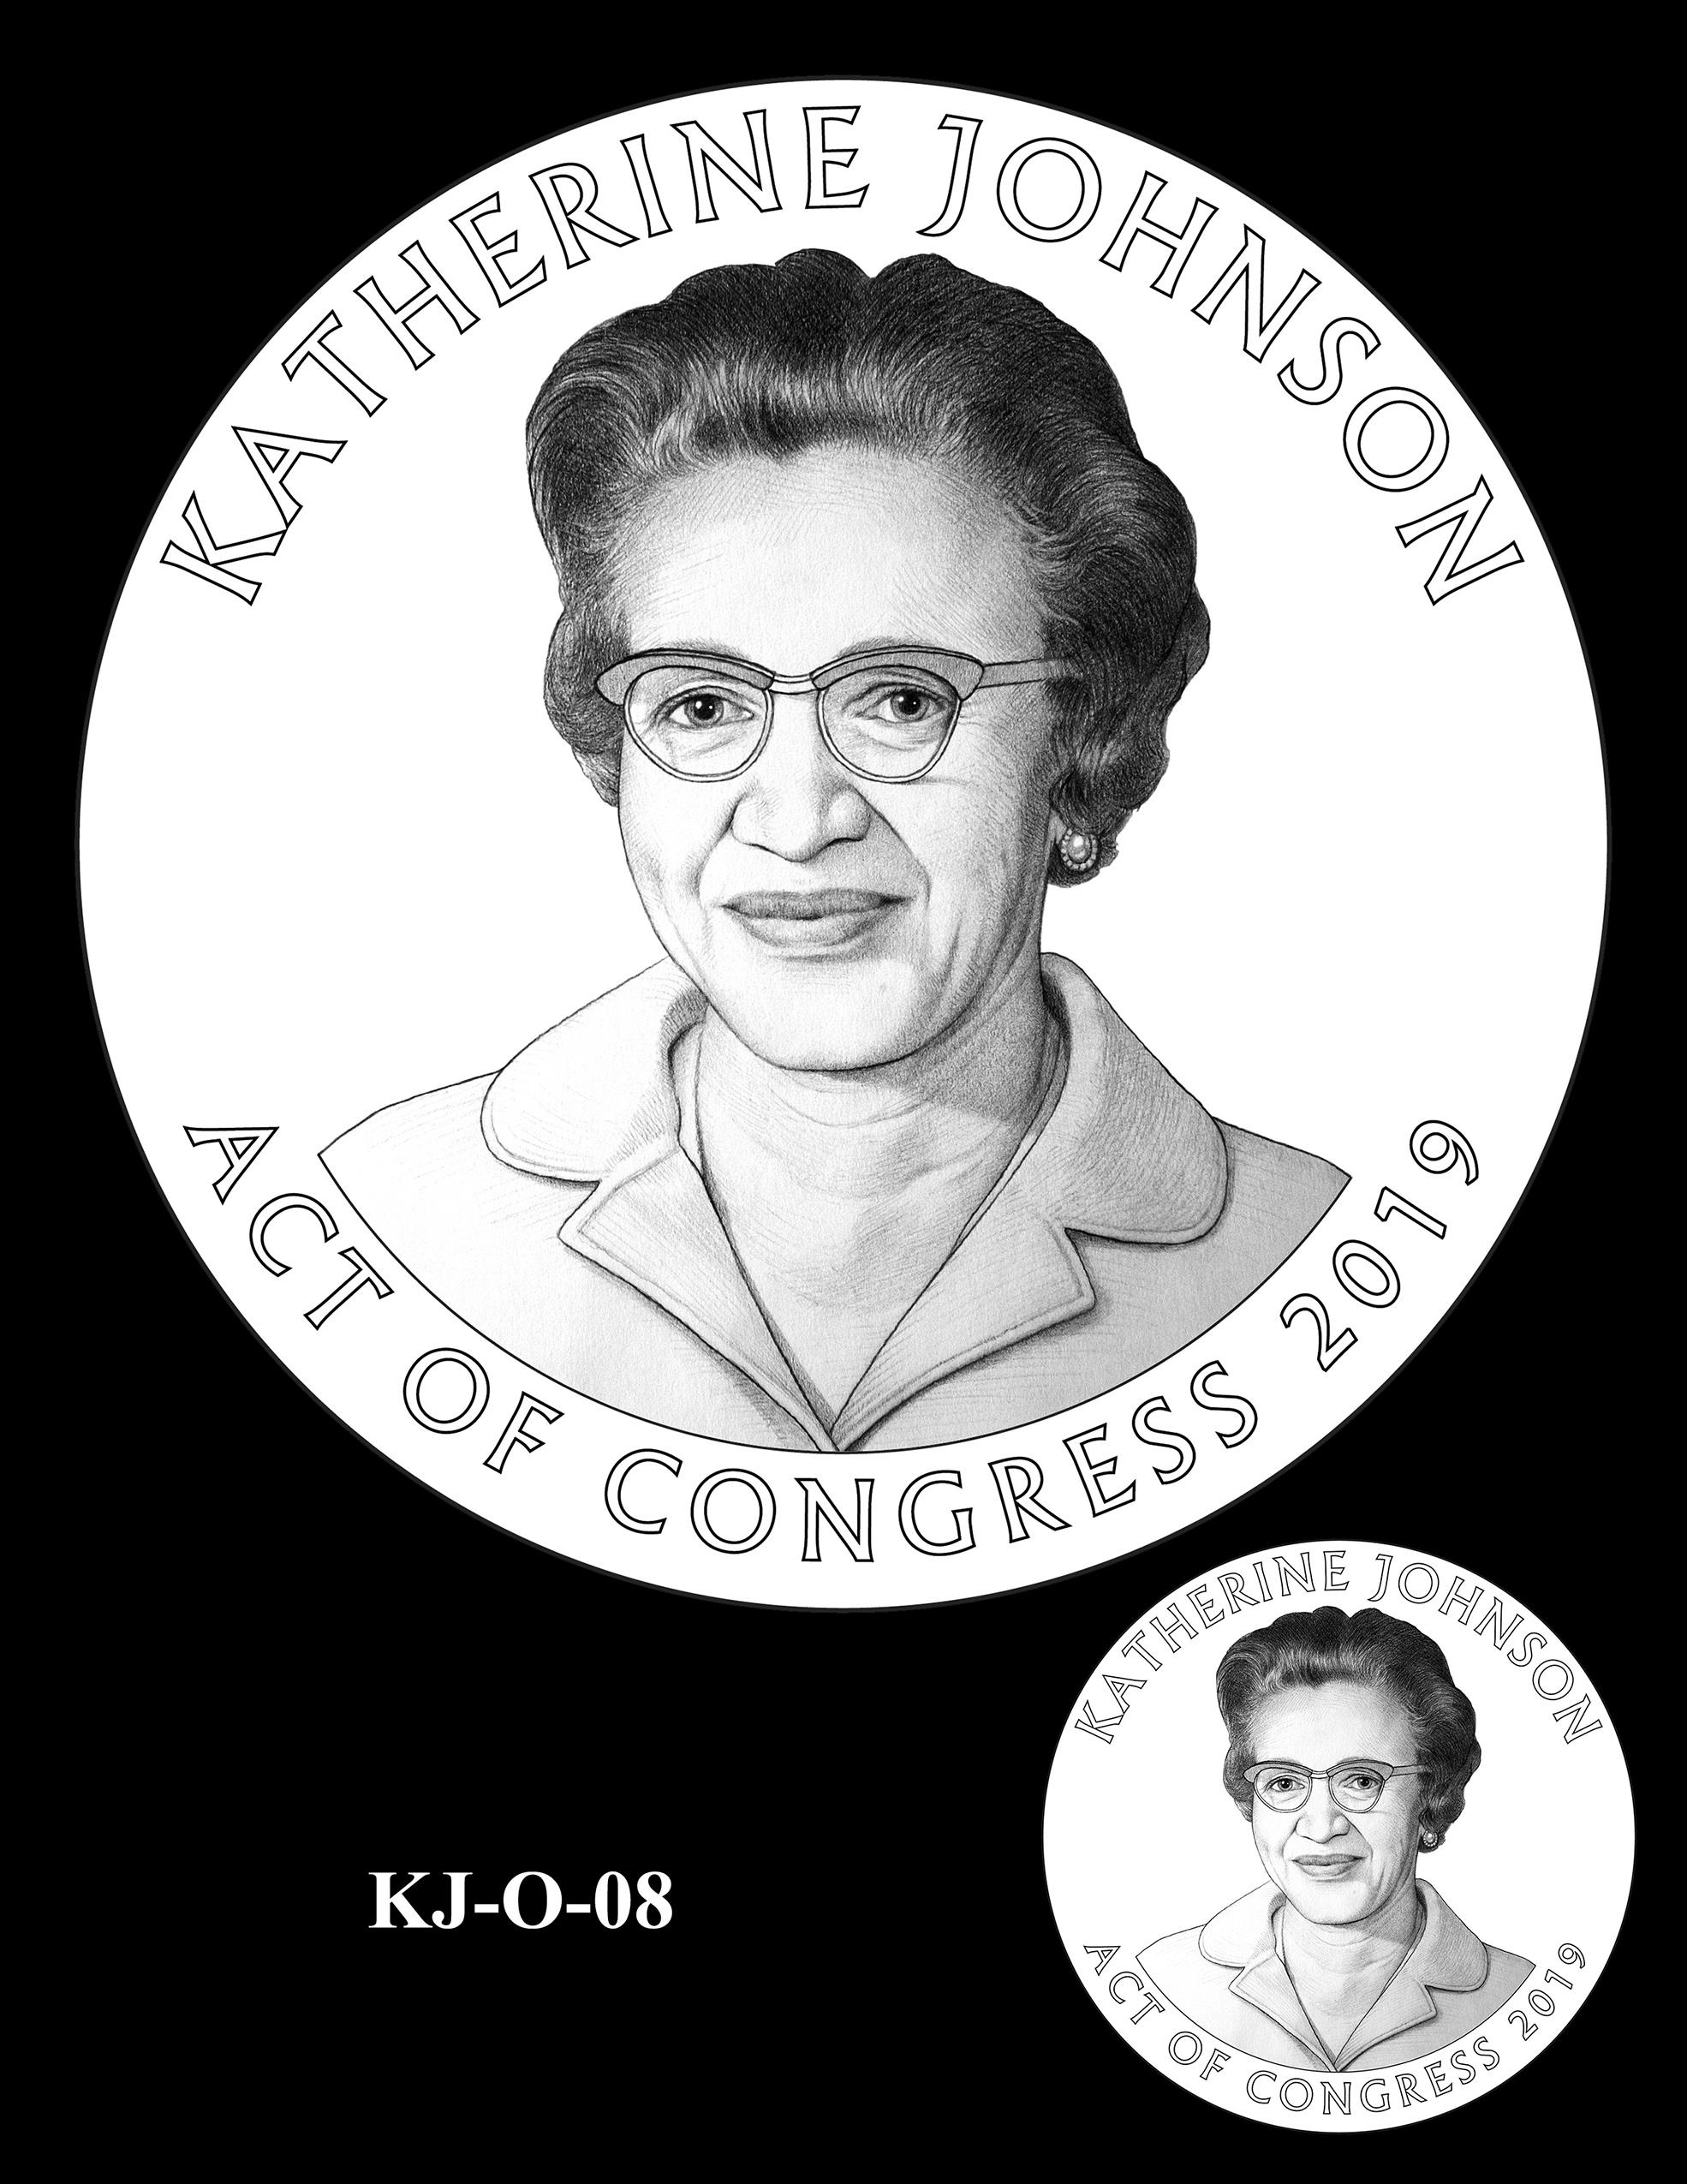 KJ-O-08 -- Katherine Johnson Congressional Gold Medal